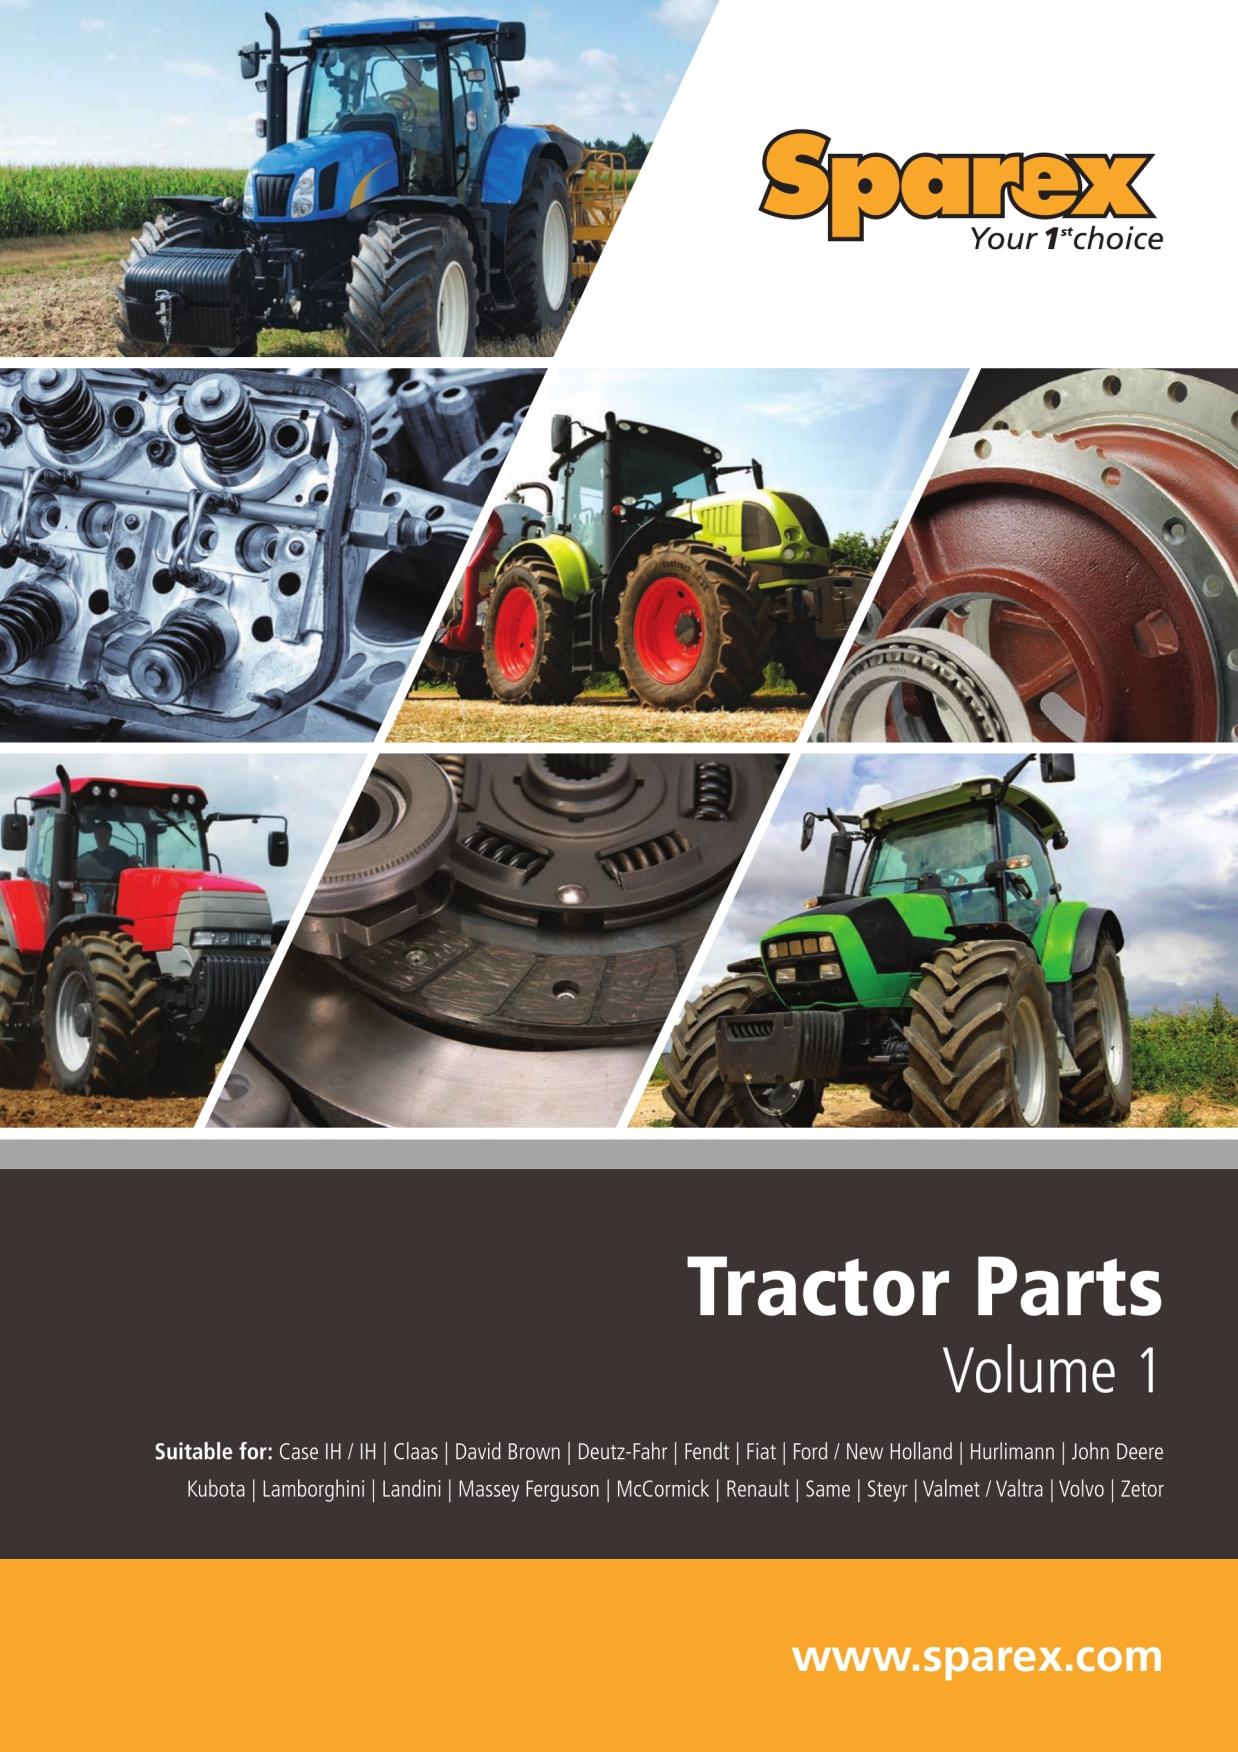 Massey,Case,IH,Deutz,Same,Landini,Renault,Ford,Fiat Tractor Fuel Filter x 1